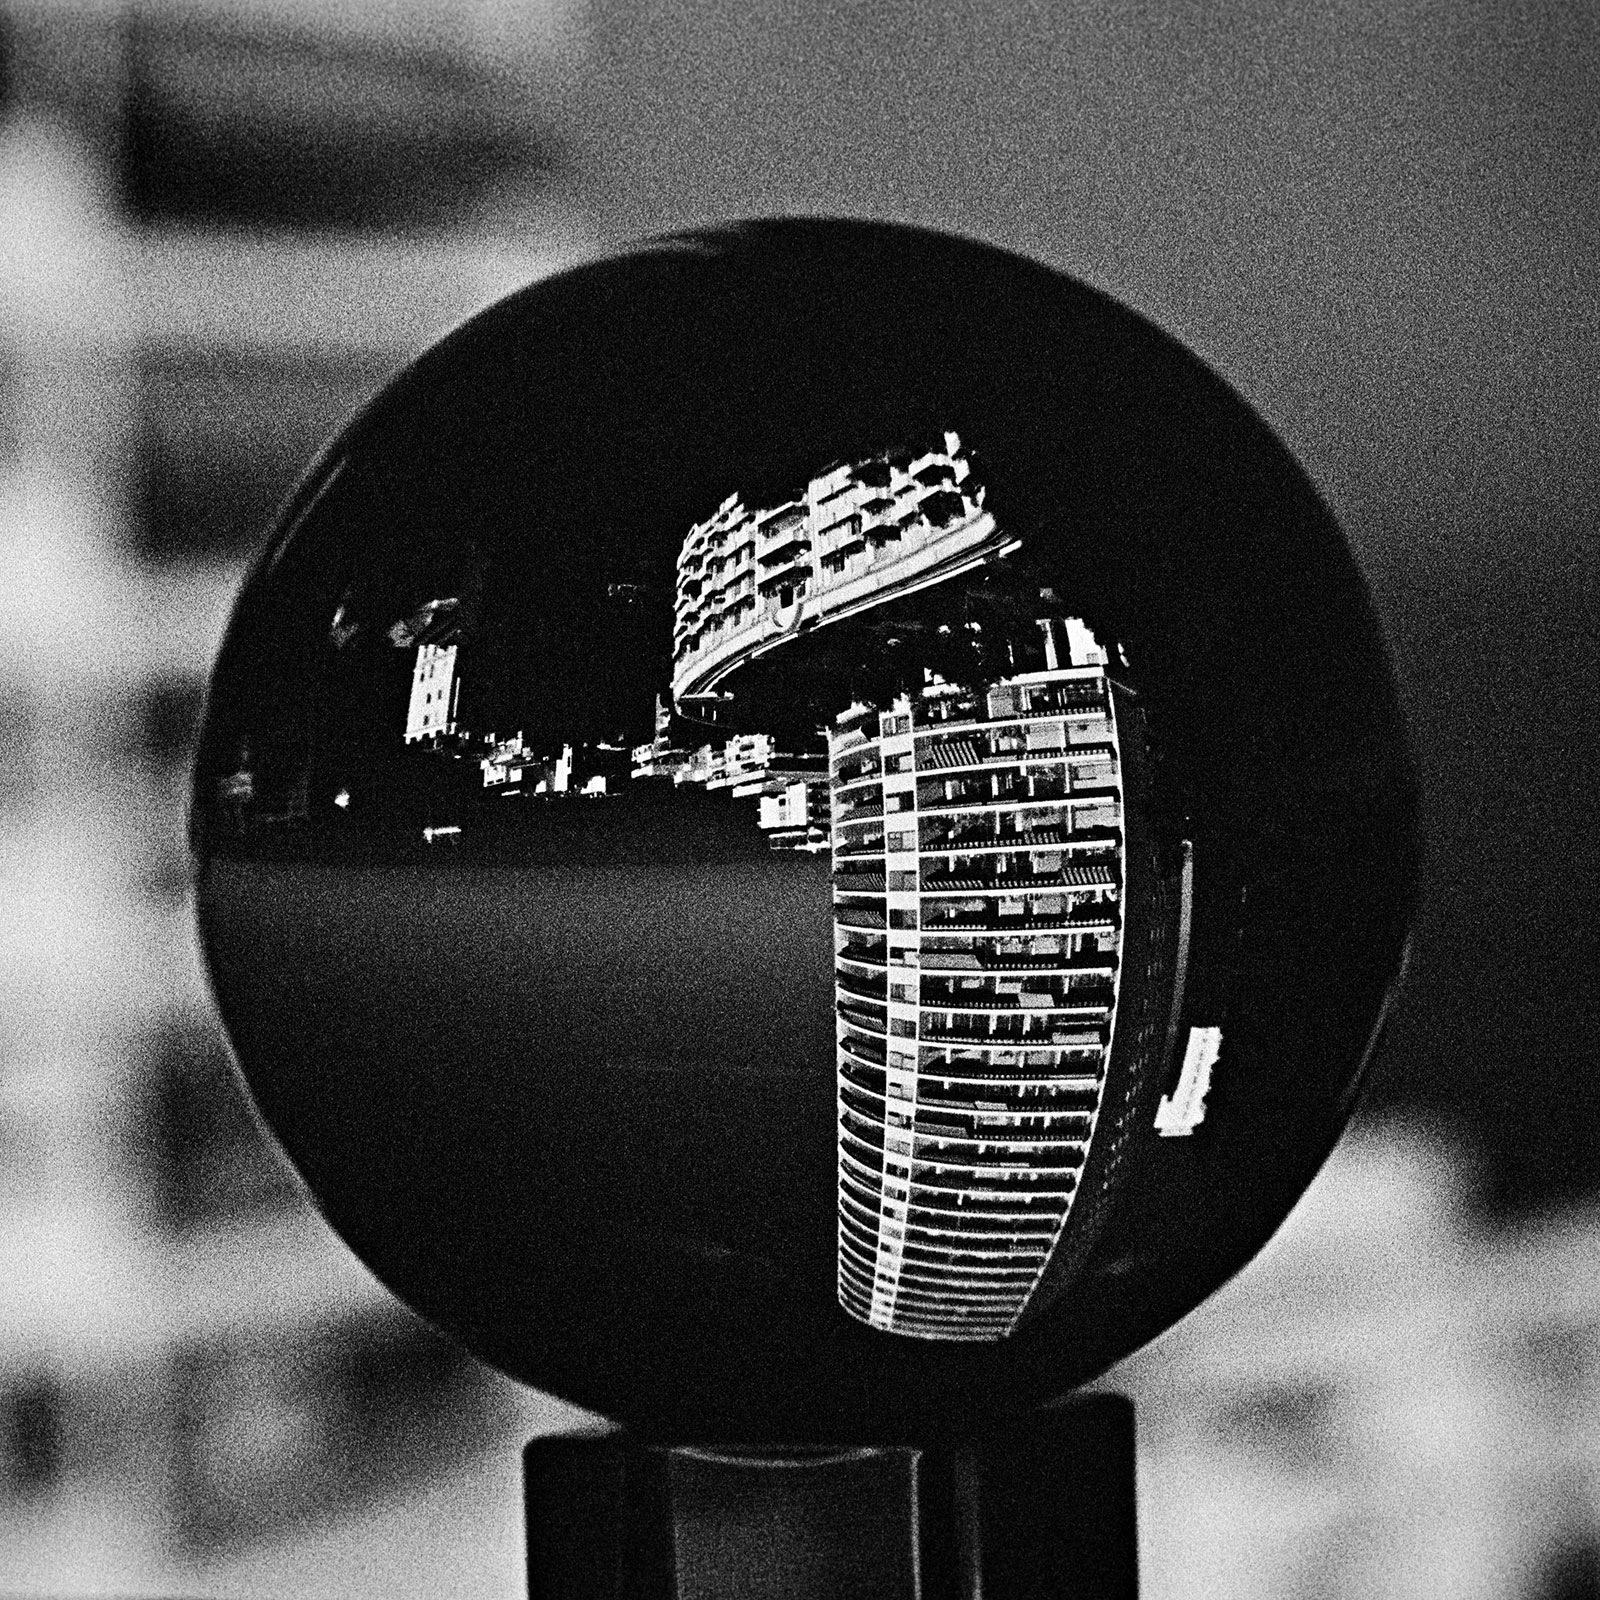 Black nightgown by Marek Fogiel